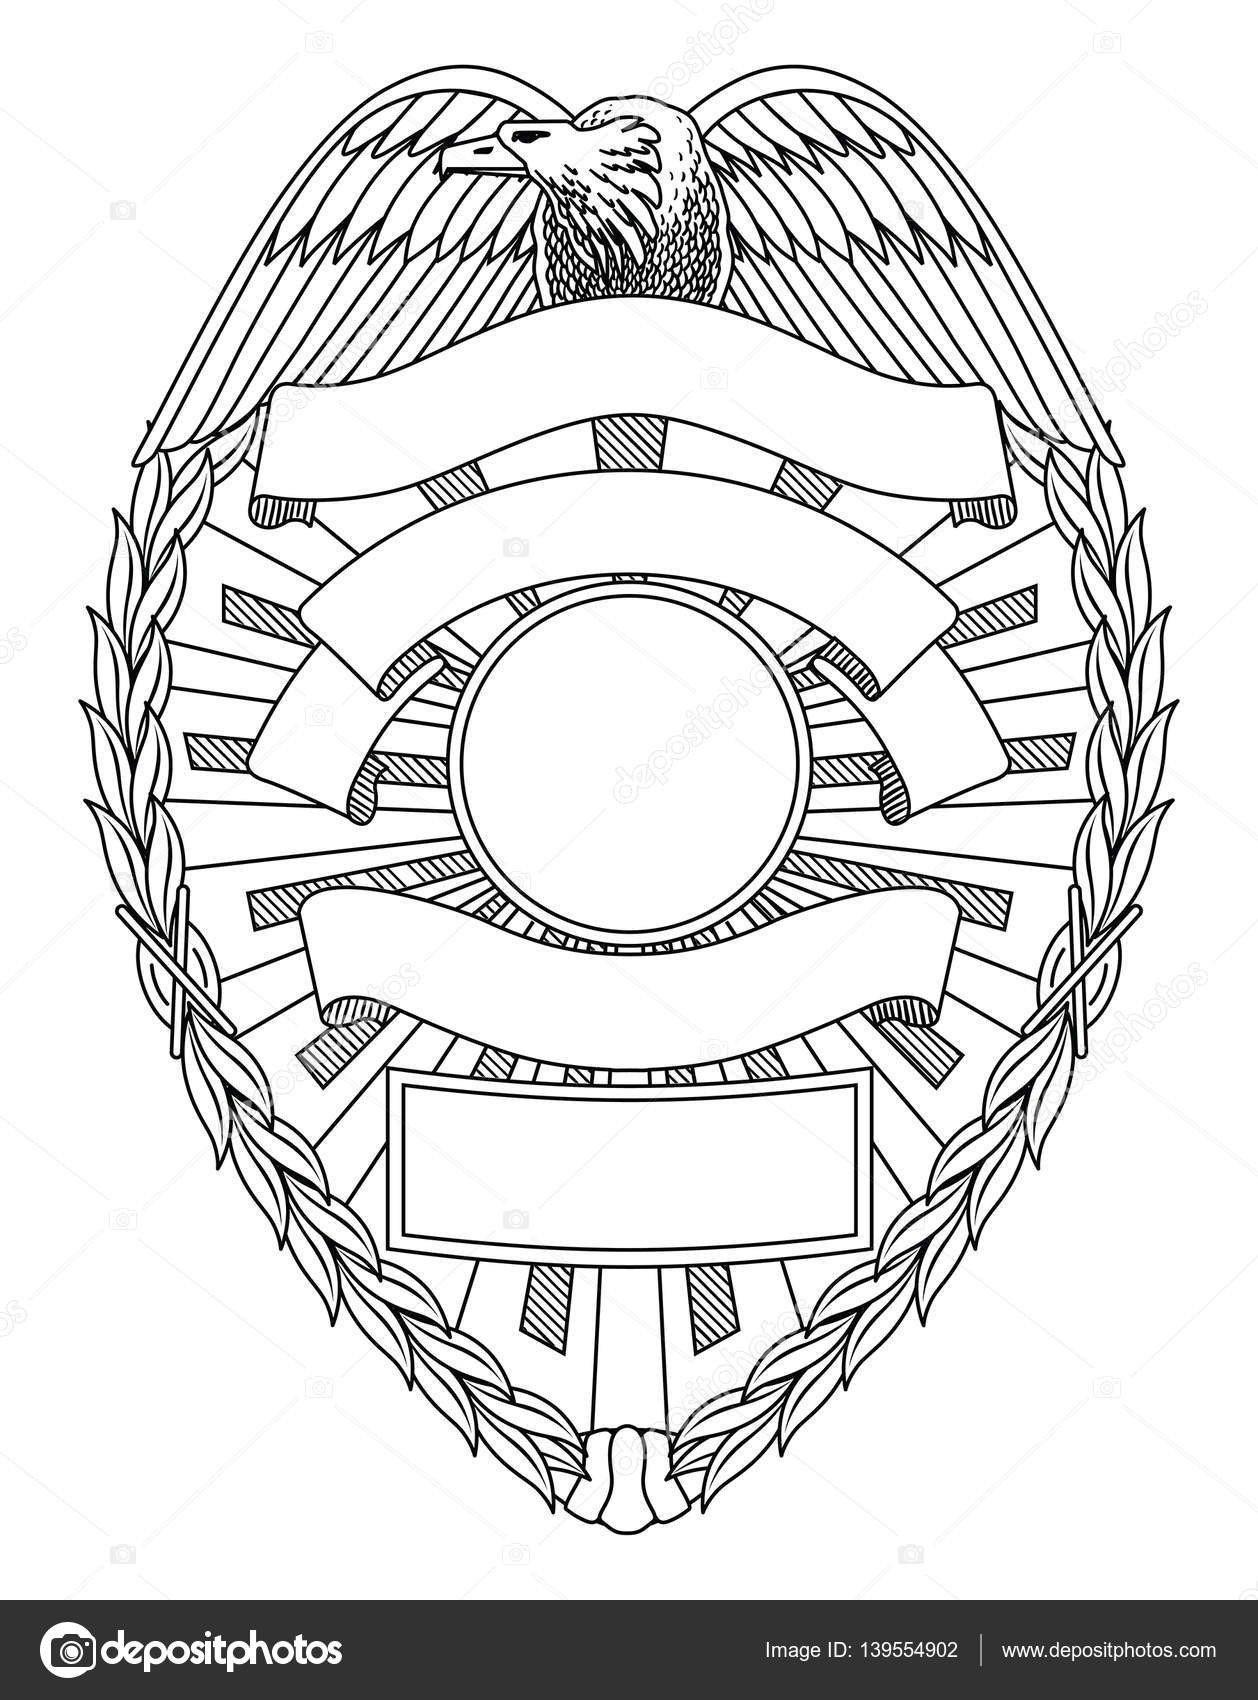 Blank Police Badge Template Police Badge Blank — Stock Vector © Awesleyfloyd